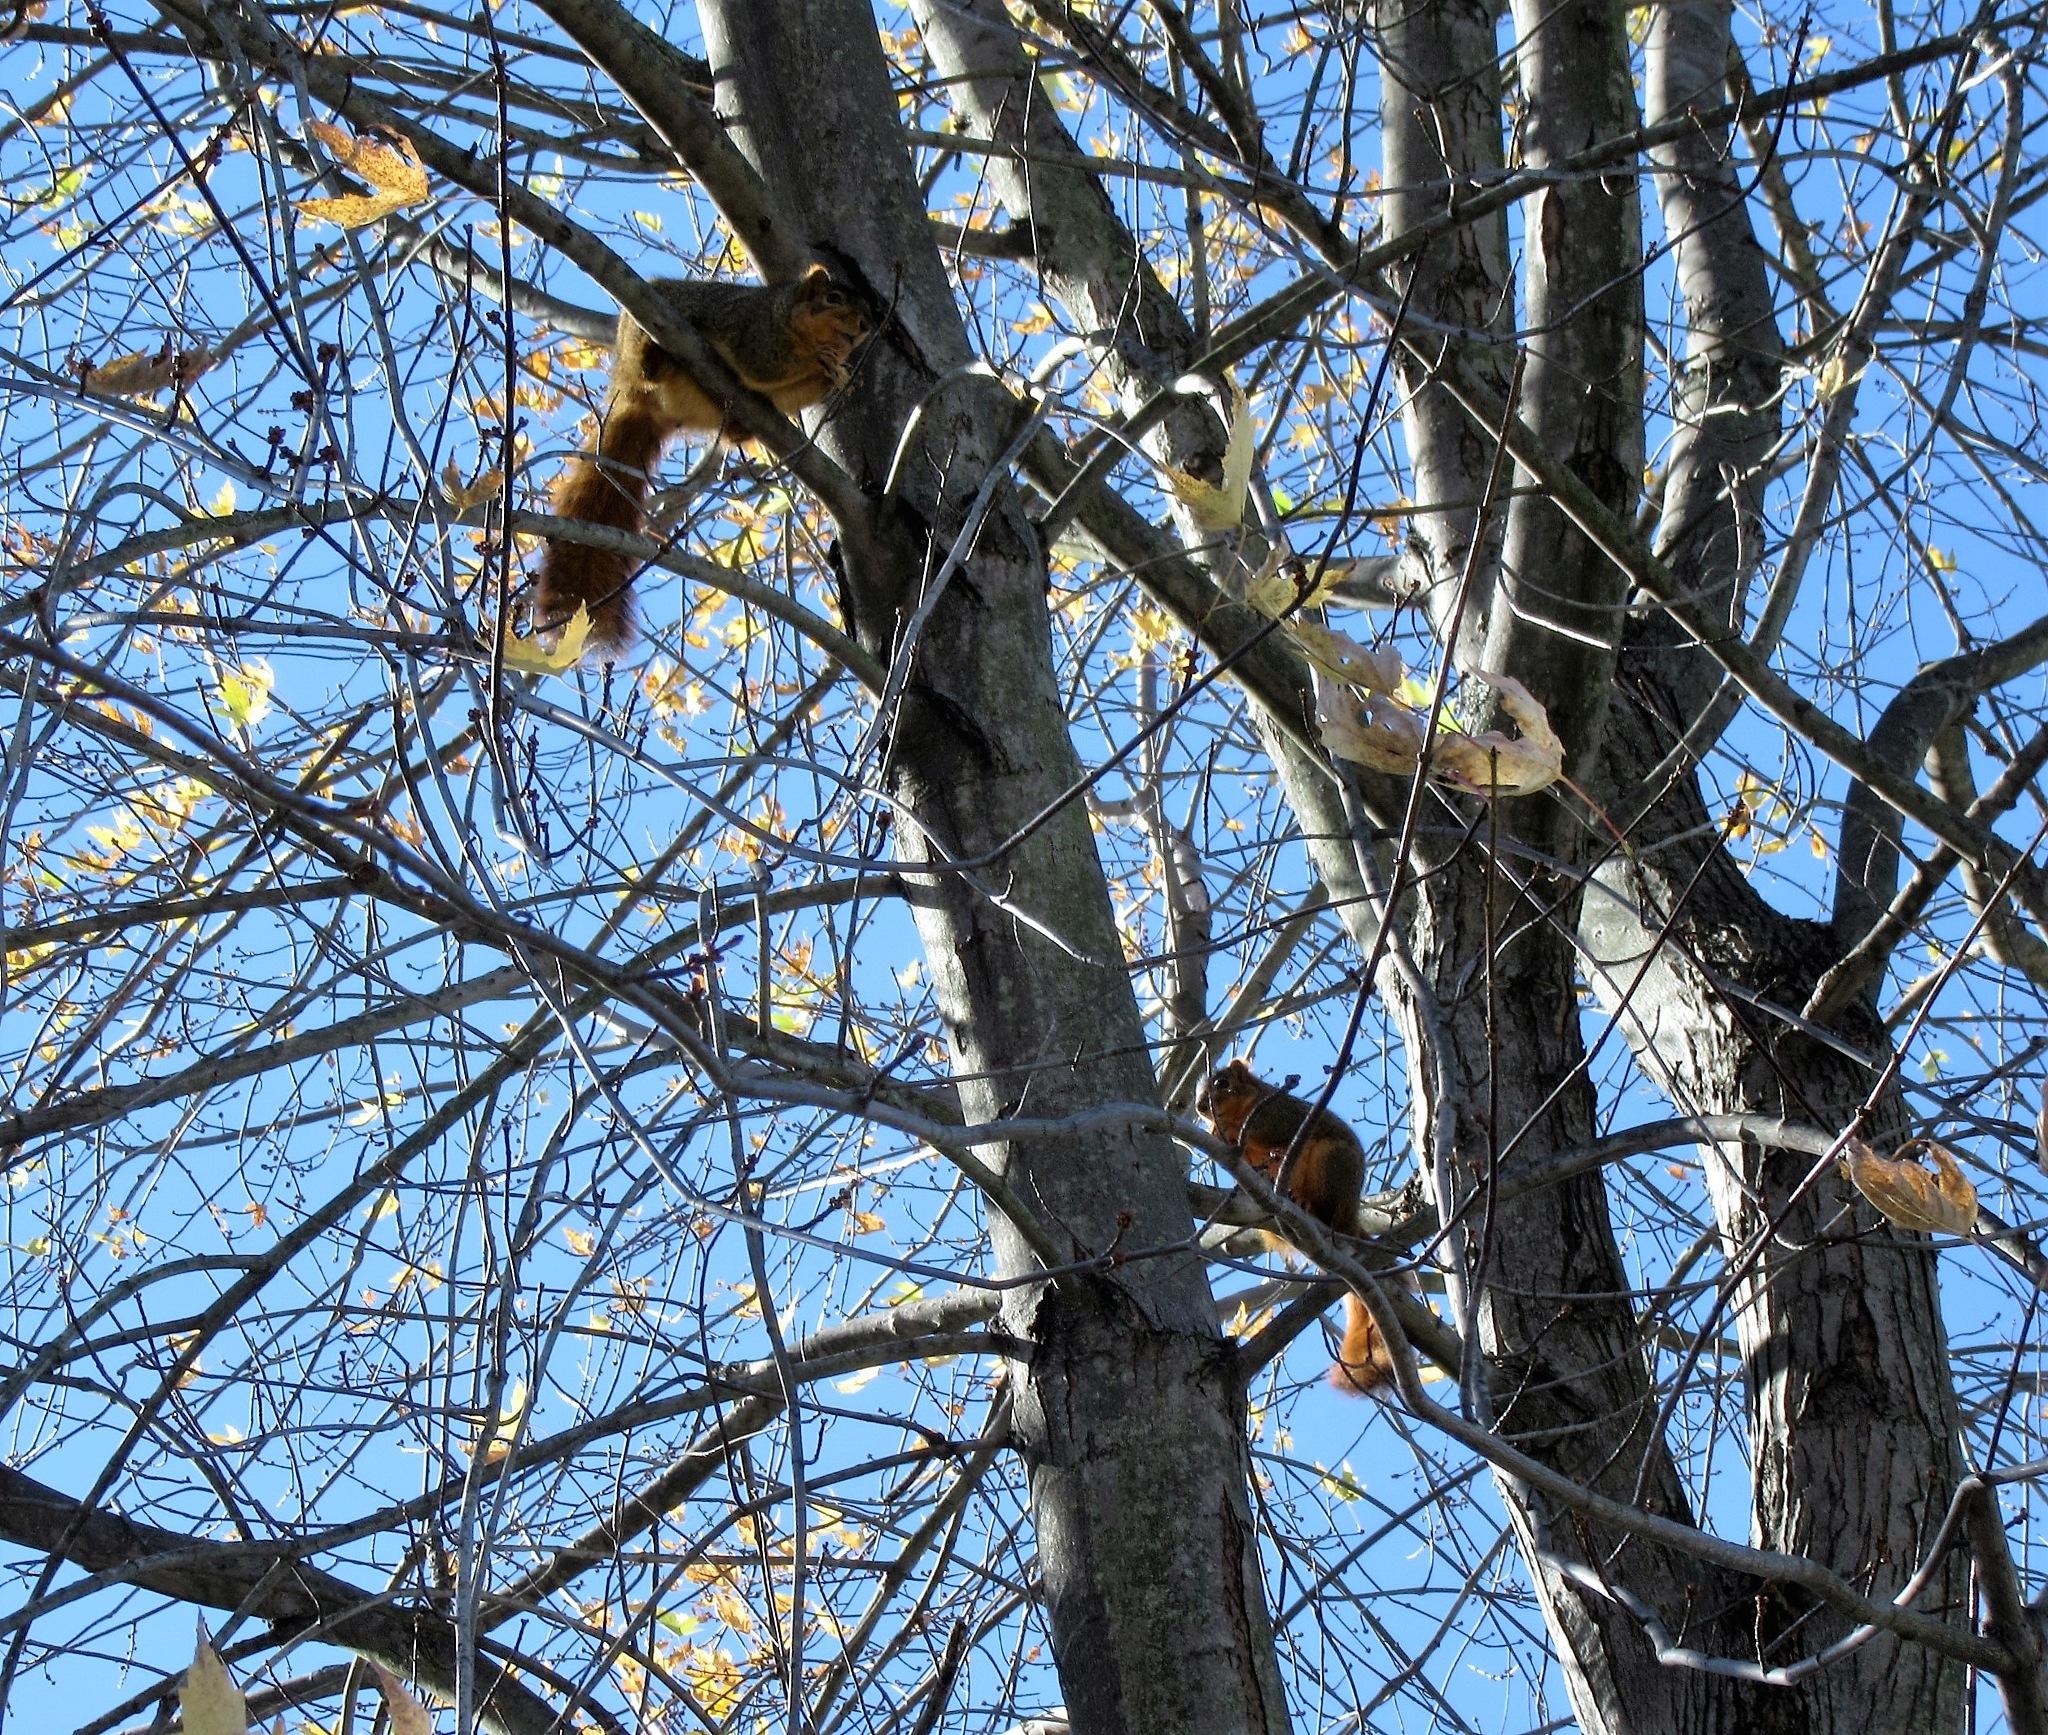 Sitting High in the Tree by Darlene Pavek